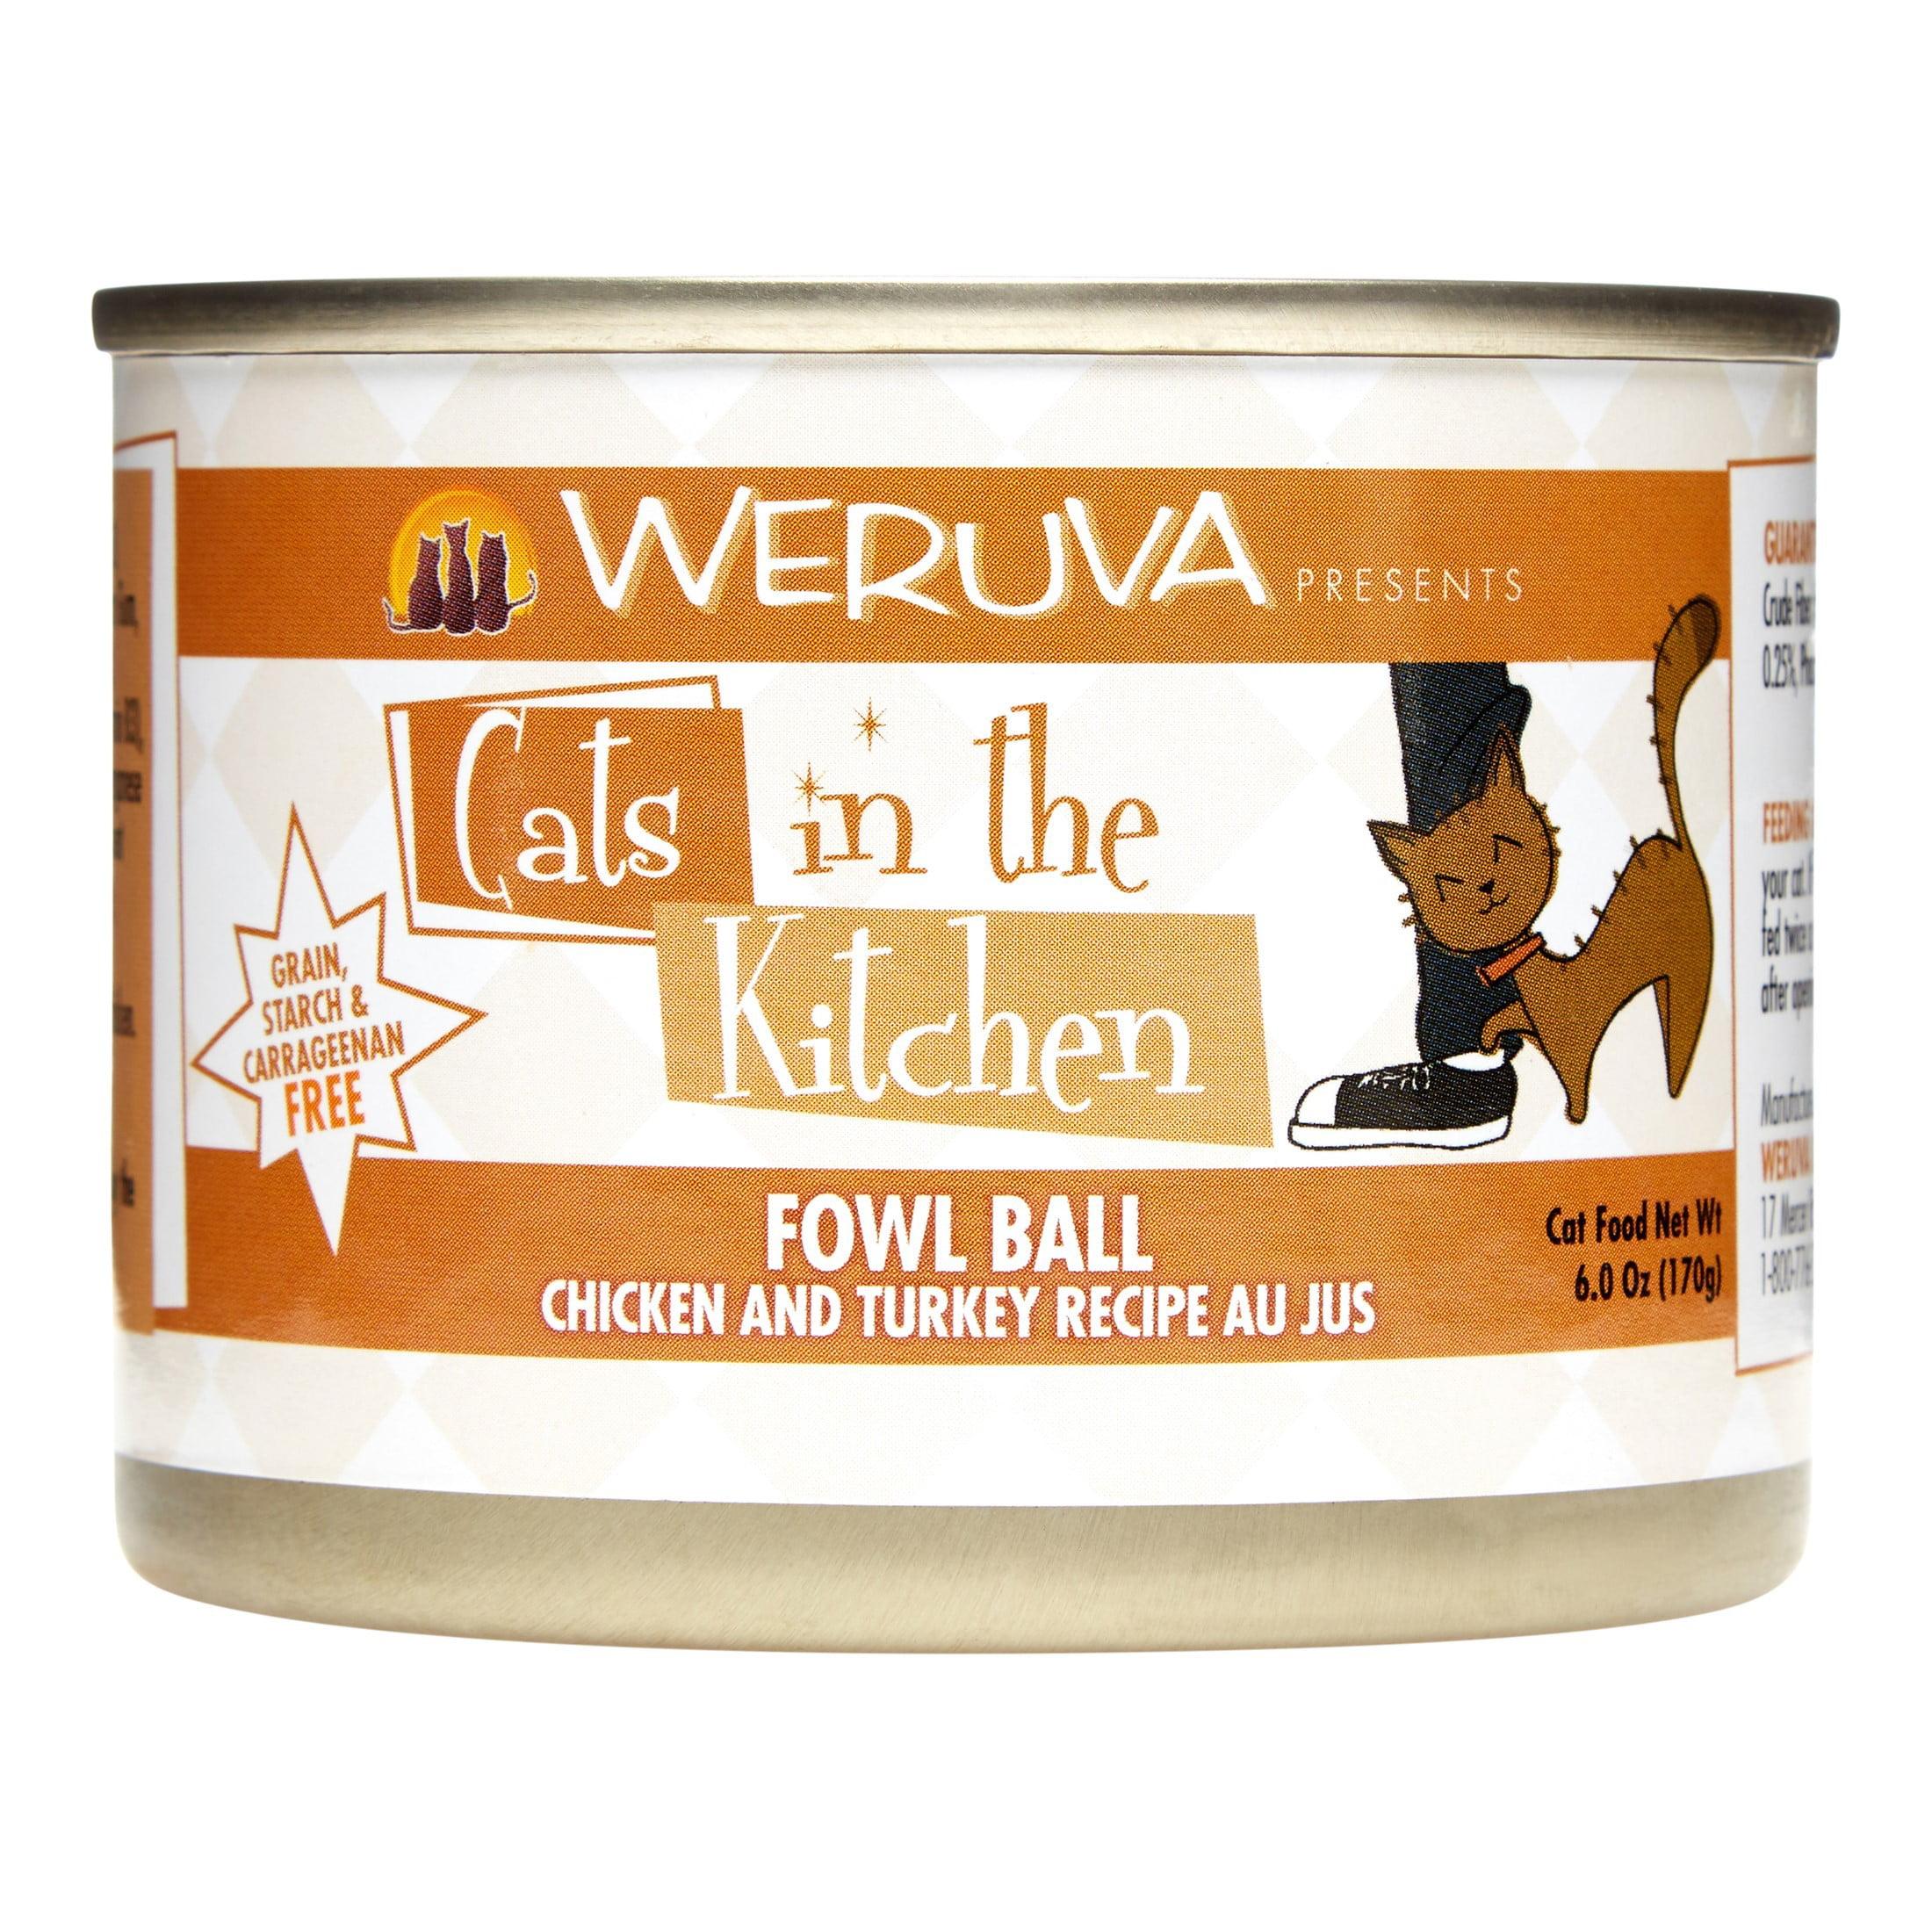 Weruva Cats in the Kitchen Grain-Free Fowl Ball Chicken & Tuckey Recipe Wet Cat Food, 6 Oz (24 Pack)